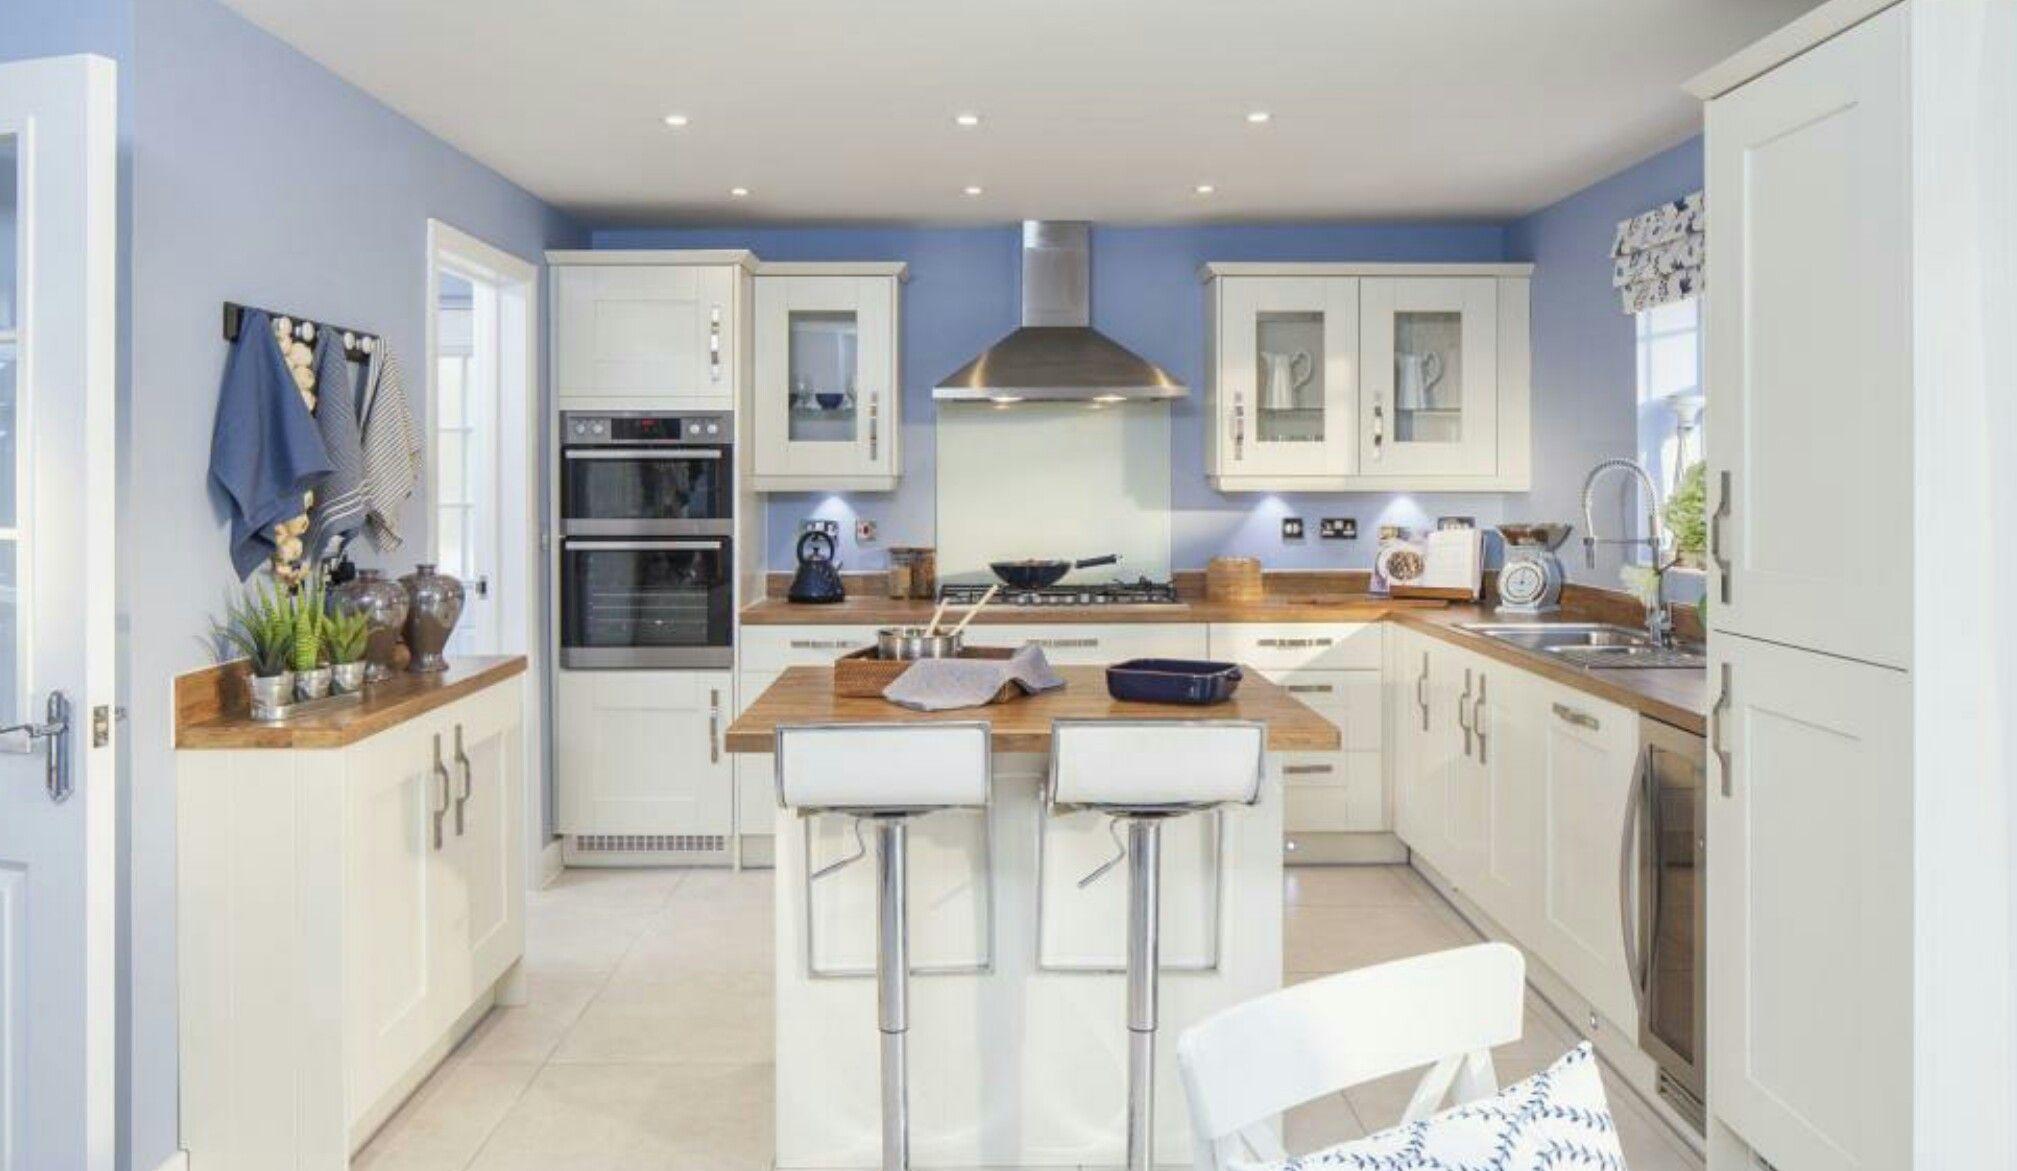 Coastal Theme Interior Designed Kitchen Dining Showhome in cream ...